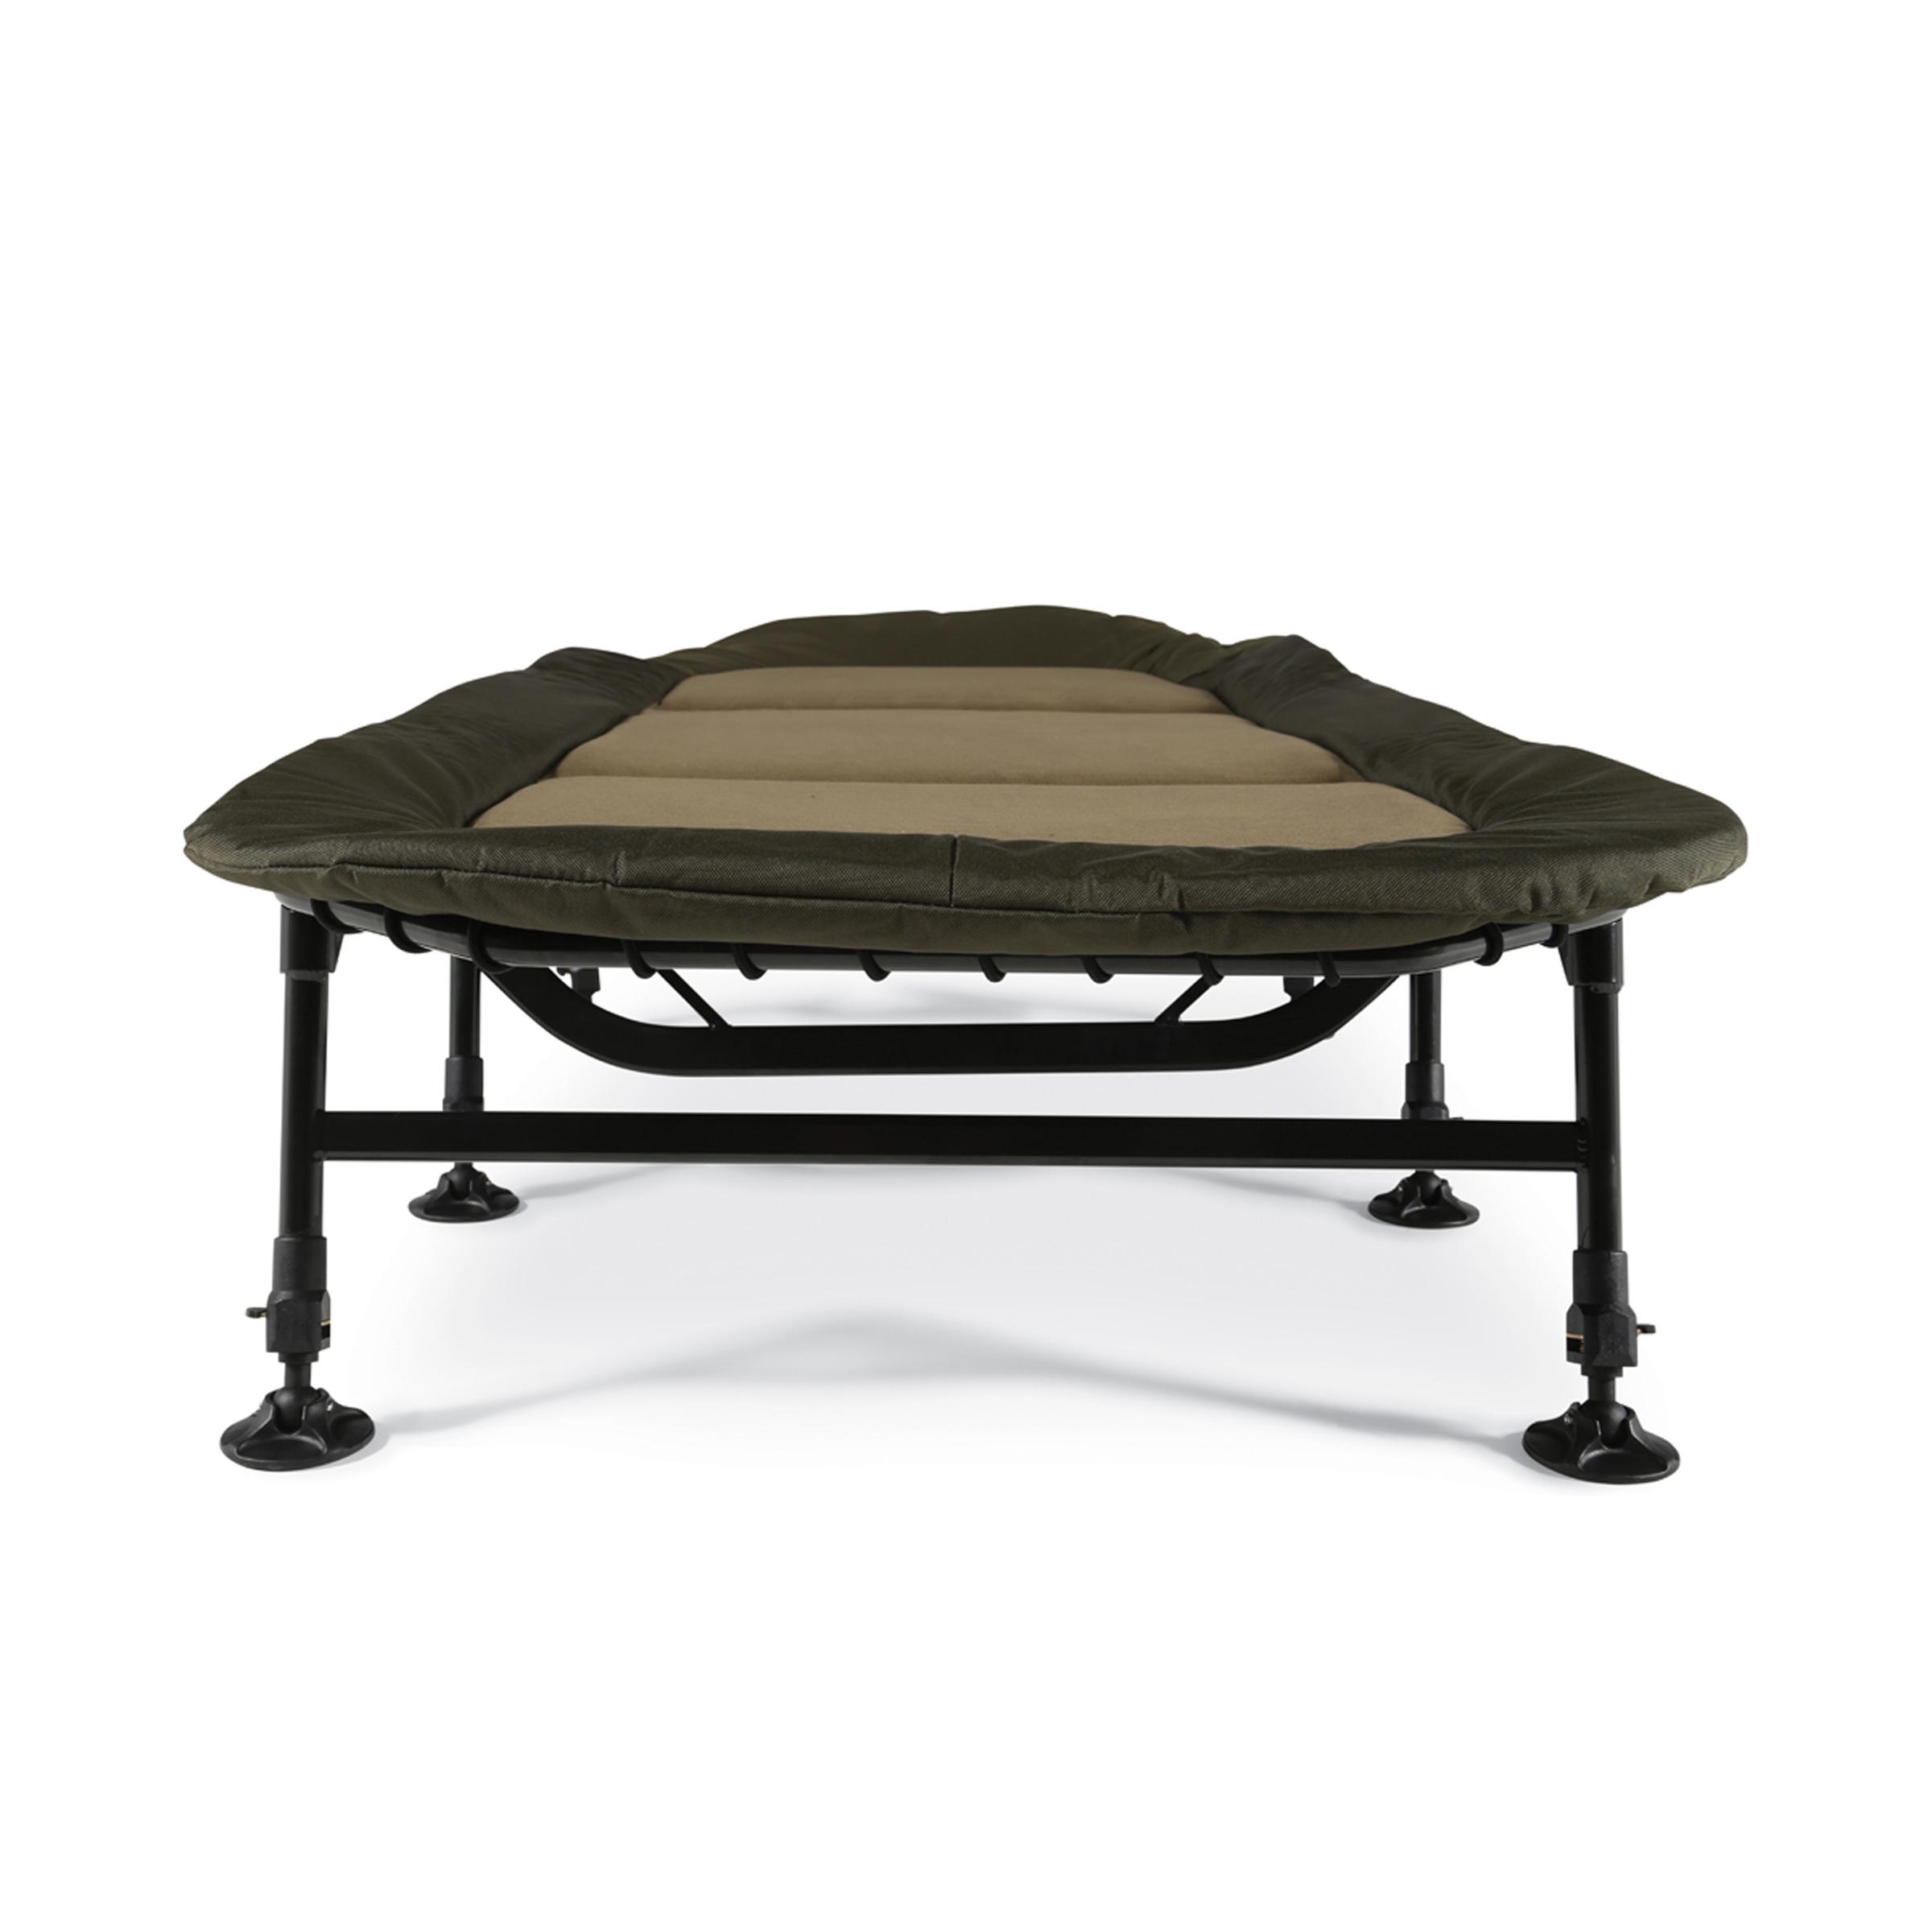 ngt fishing chair earthlite avila ii massage brand new cyprinus extra wide flat carp bed